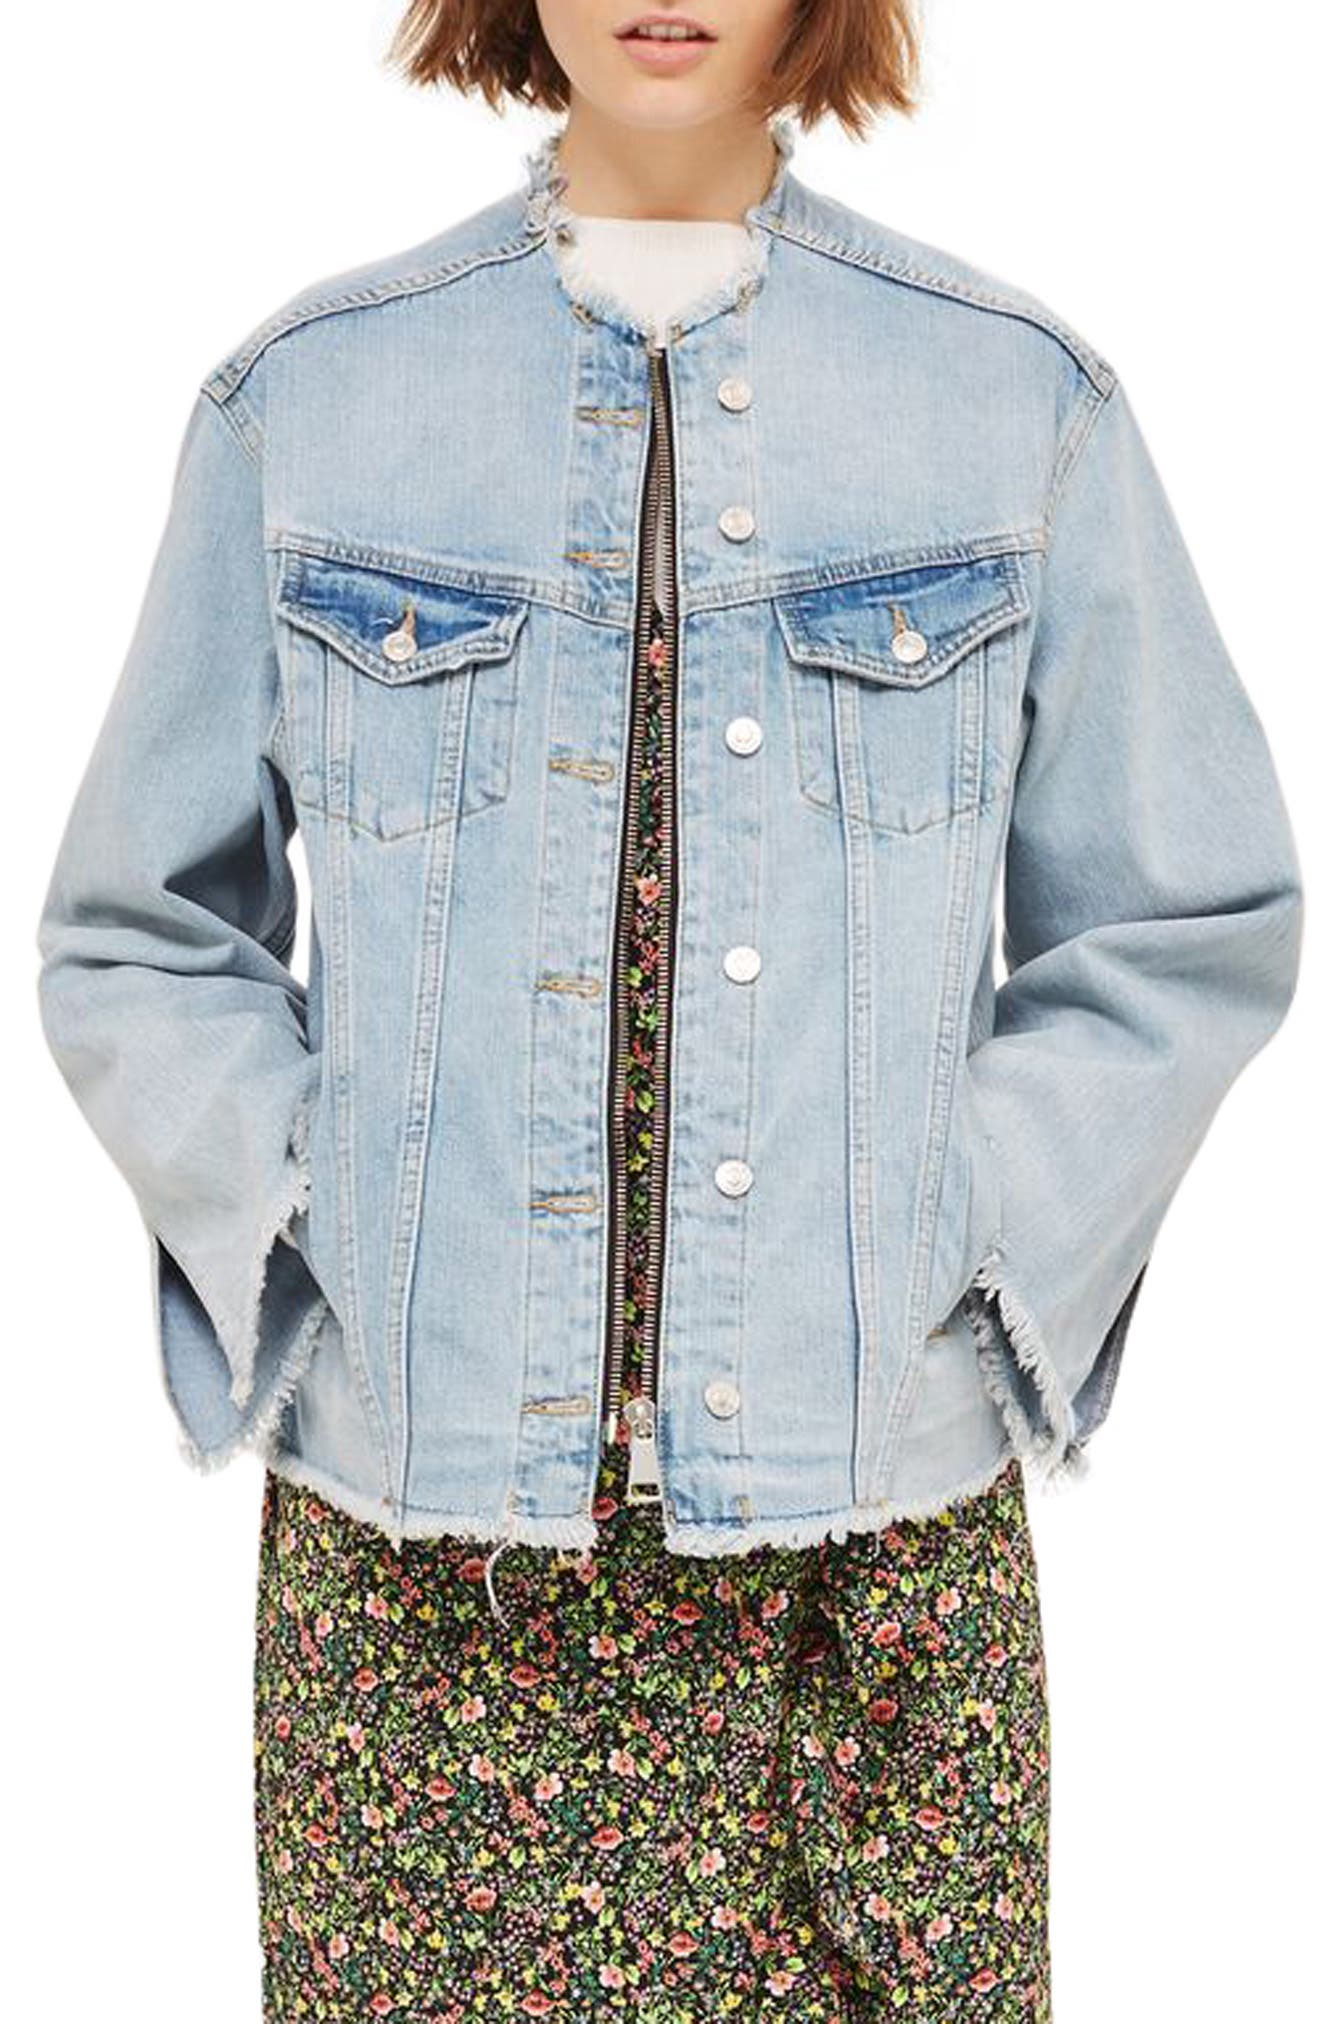 Alternate Image 1 Selected - Topshop Zip Through Denim Jacket